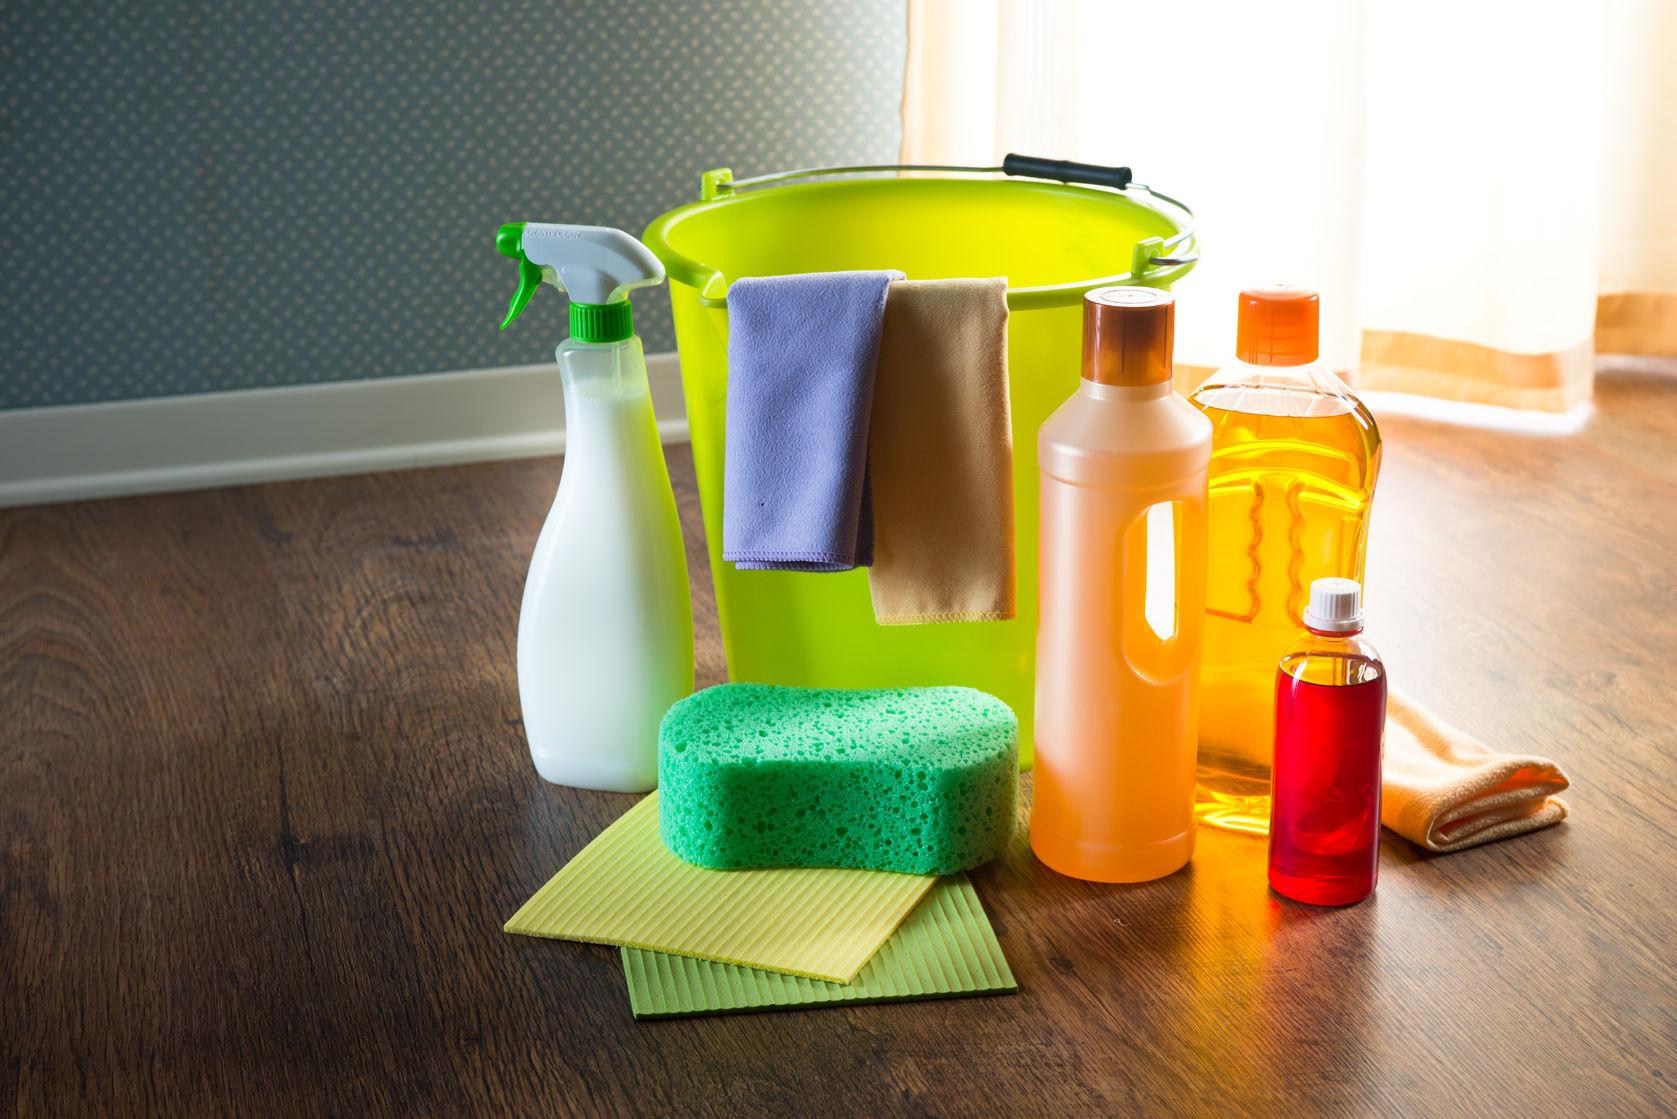 Productos para limpiar persianas